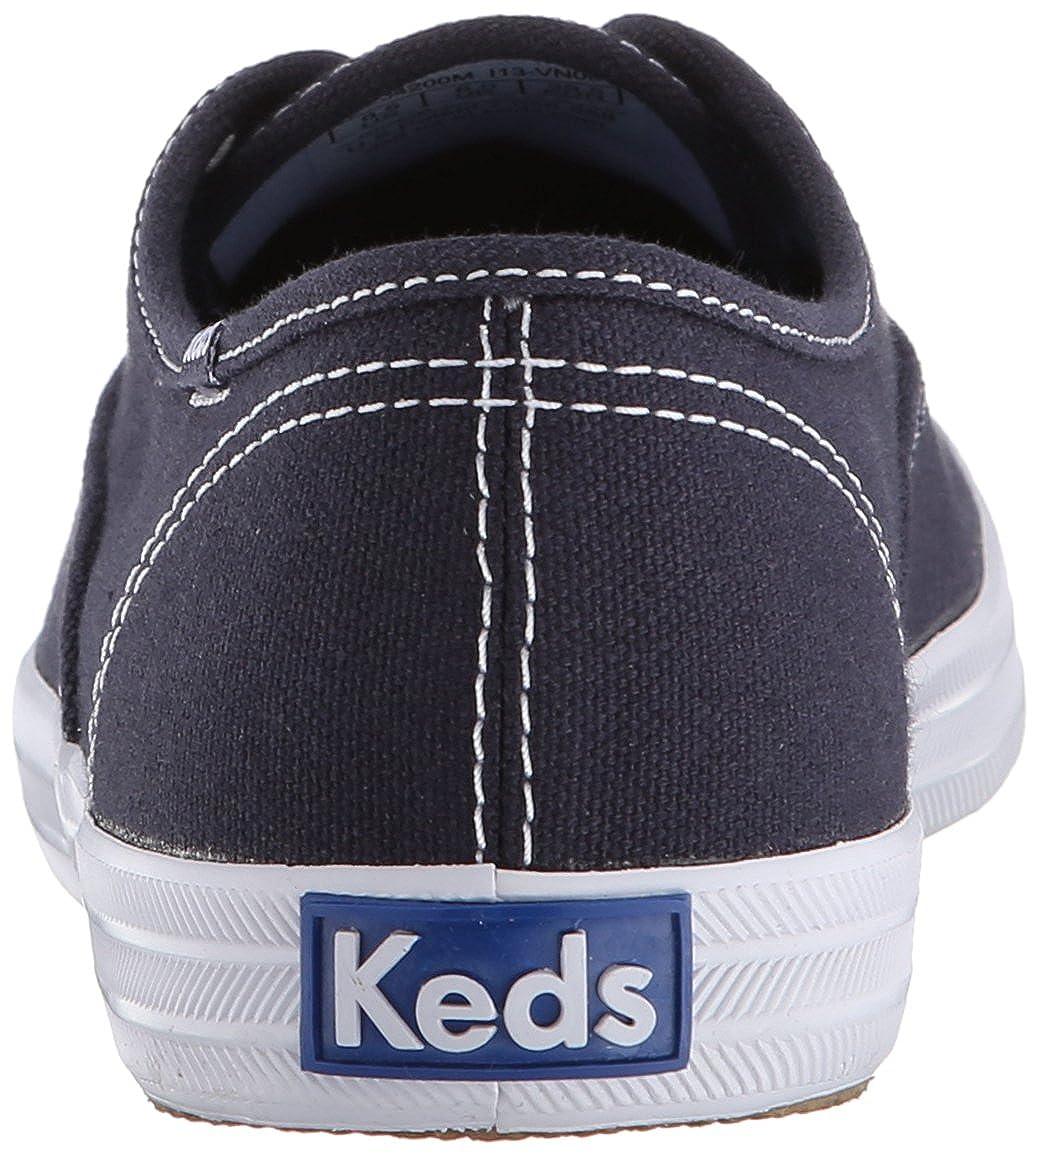 Keds Womens Champion Original Canvas Sneaker